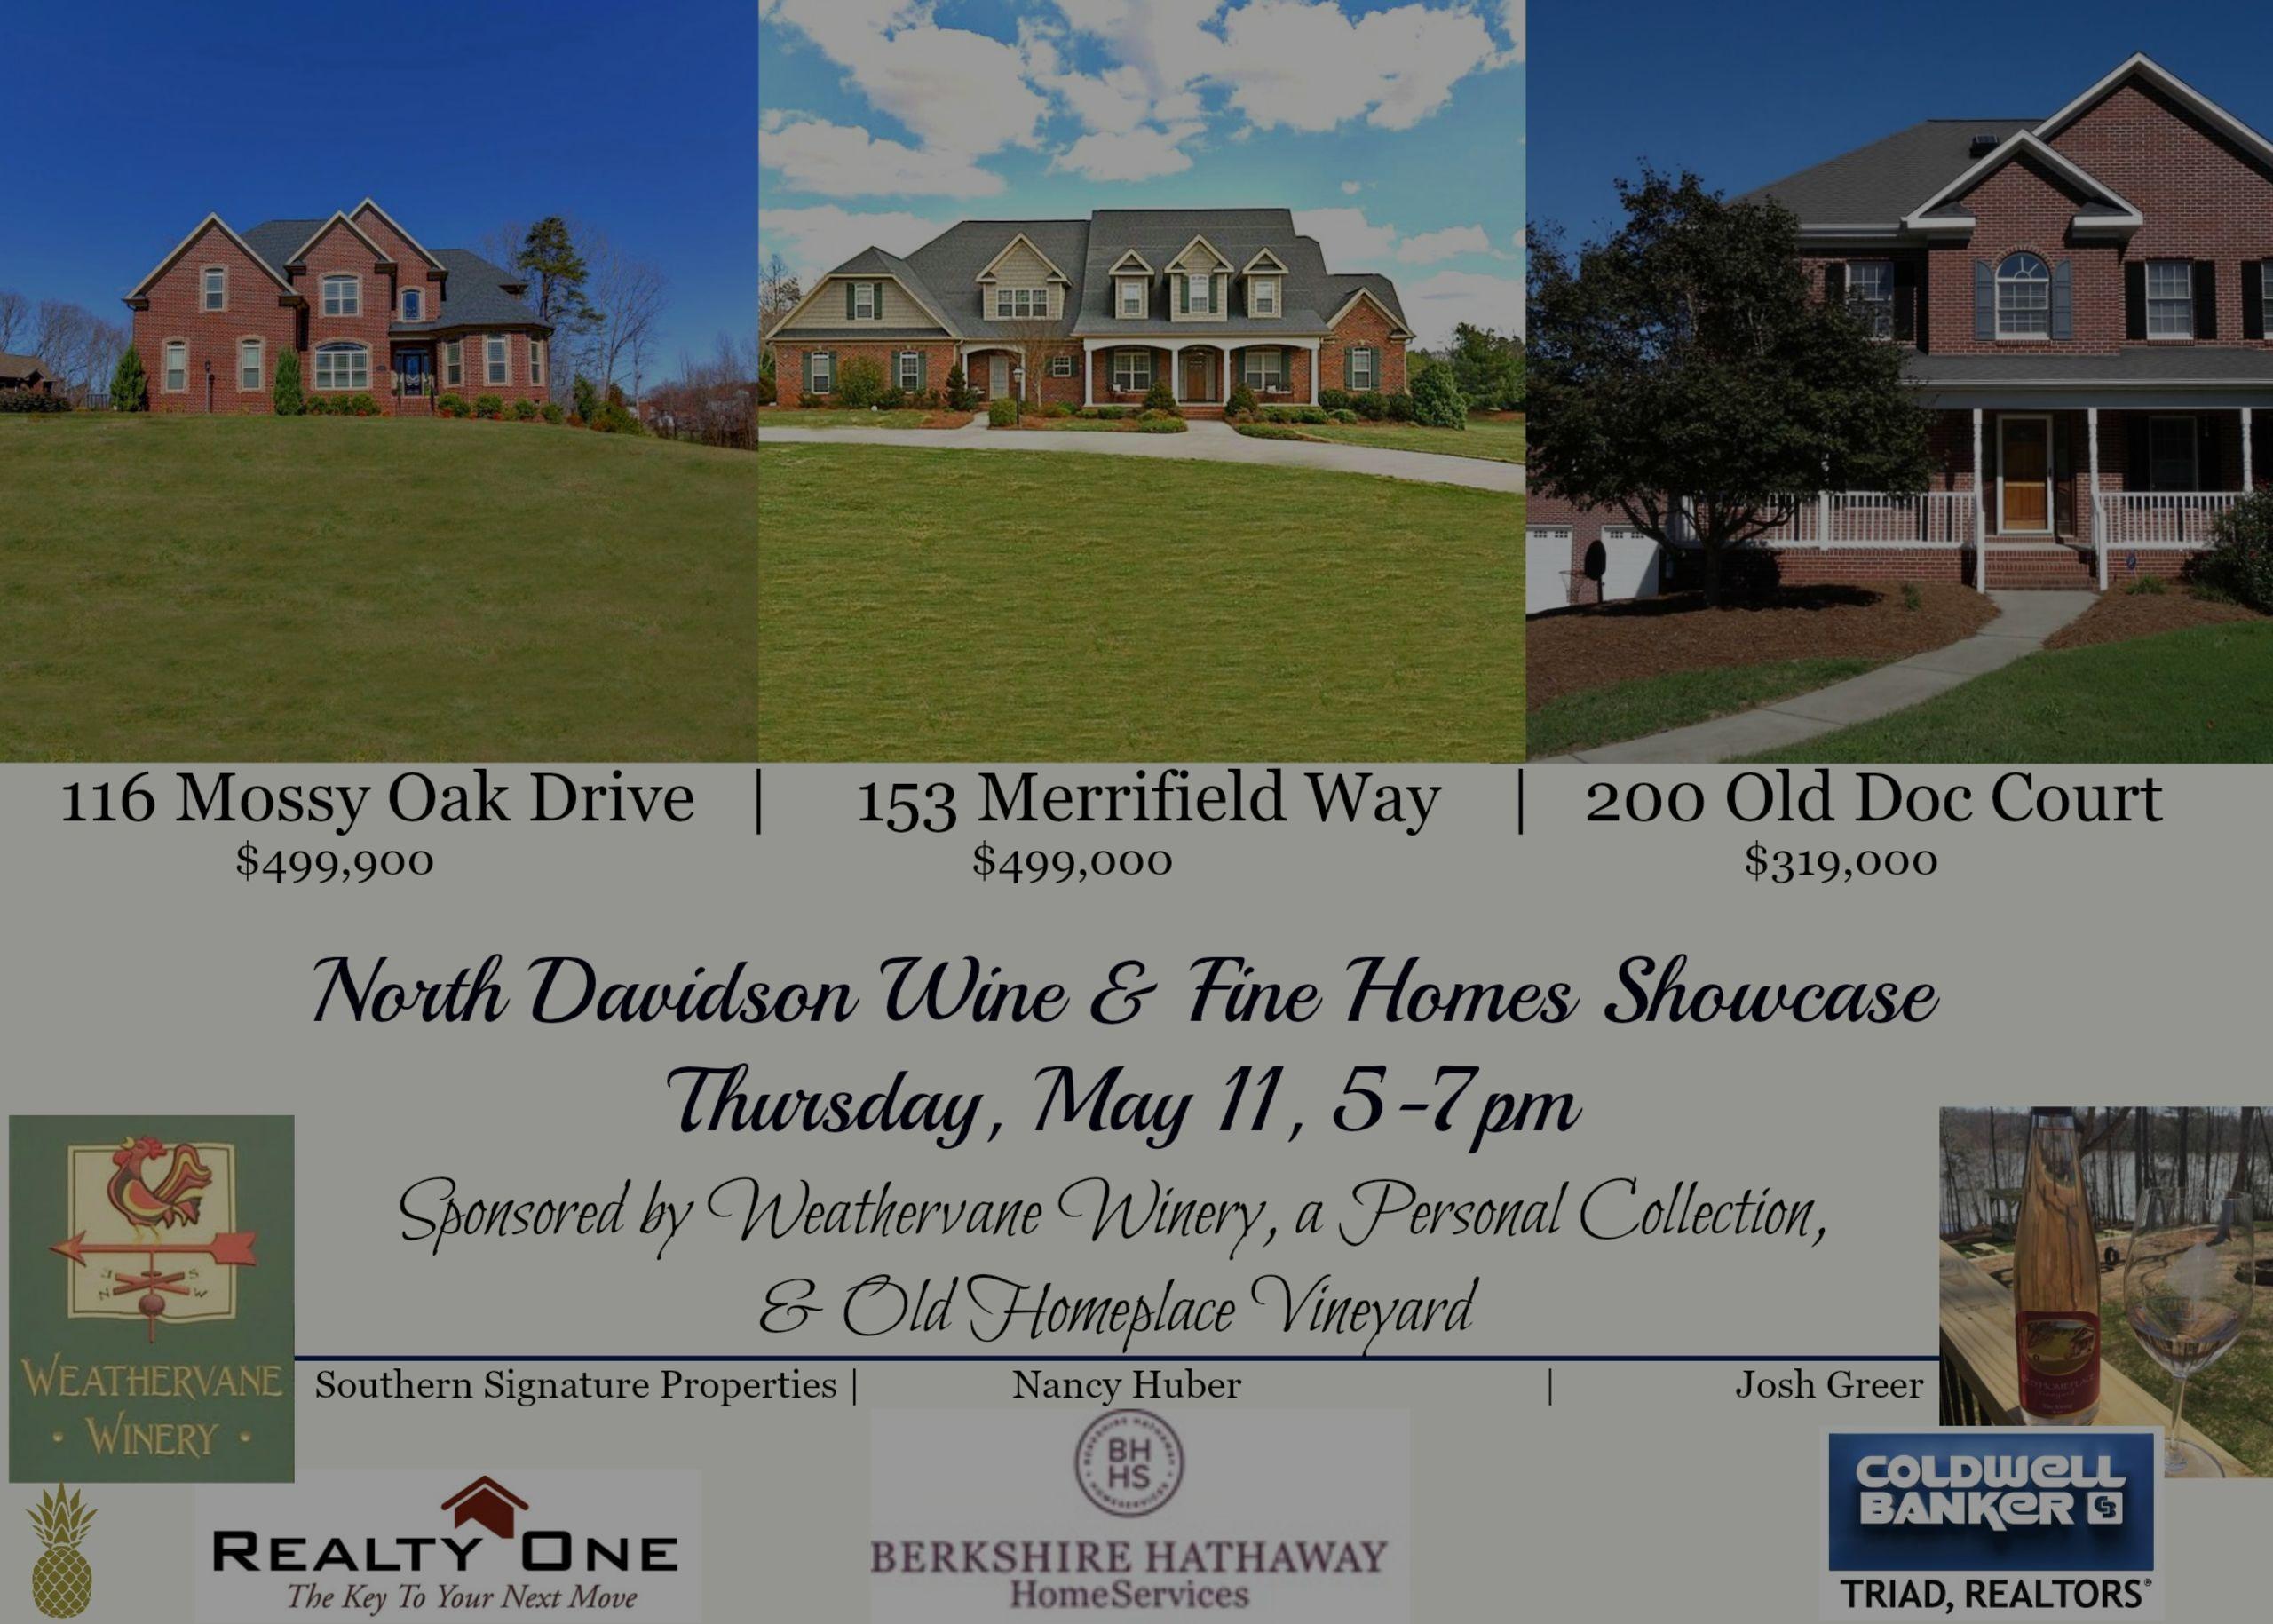 North Davidson Wine and Fine Homes Showcase